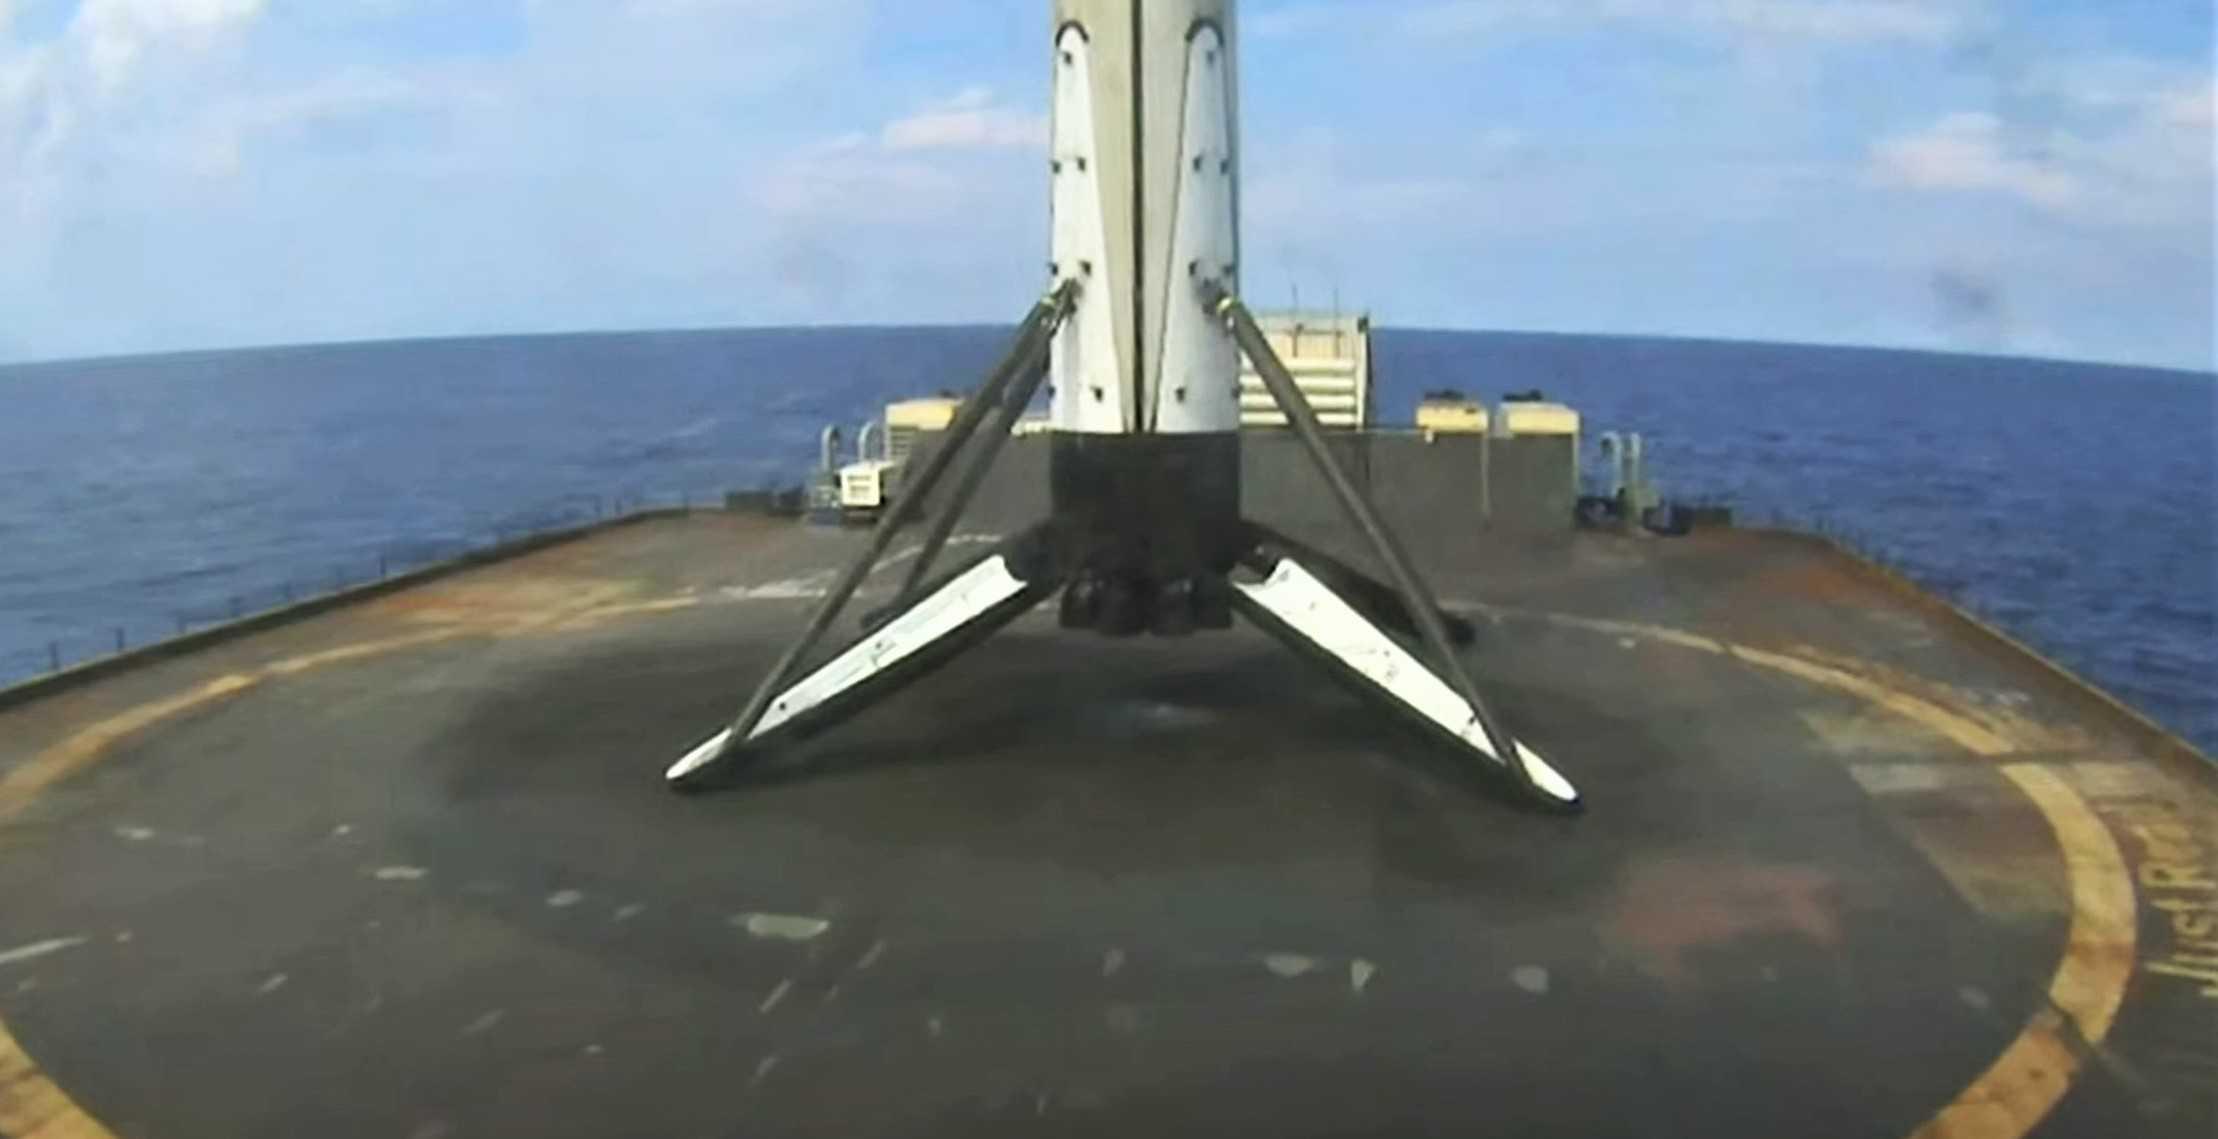 GPS III SV03 Falcon 9 B1060 webcast 063020 (SpaceX) landing 3 (c)